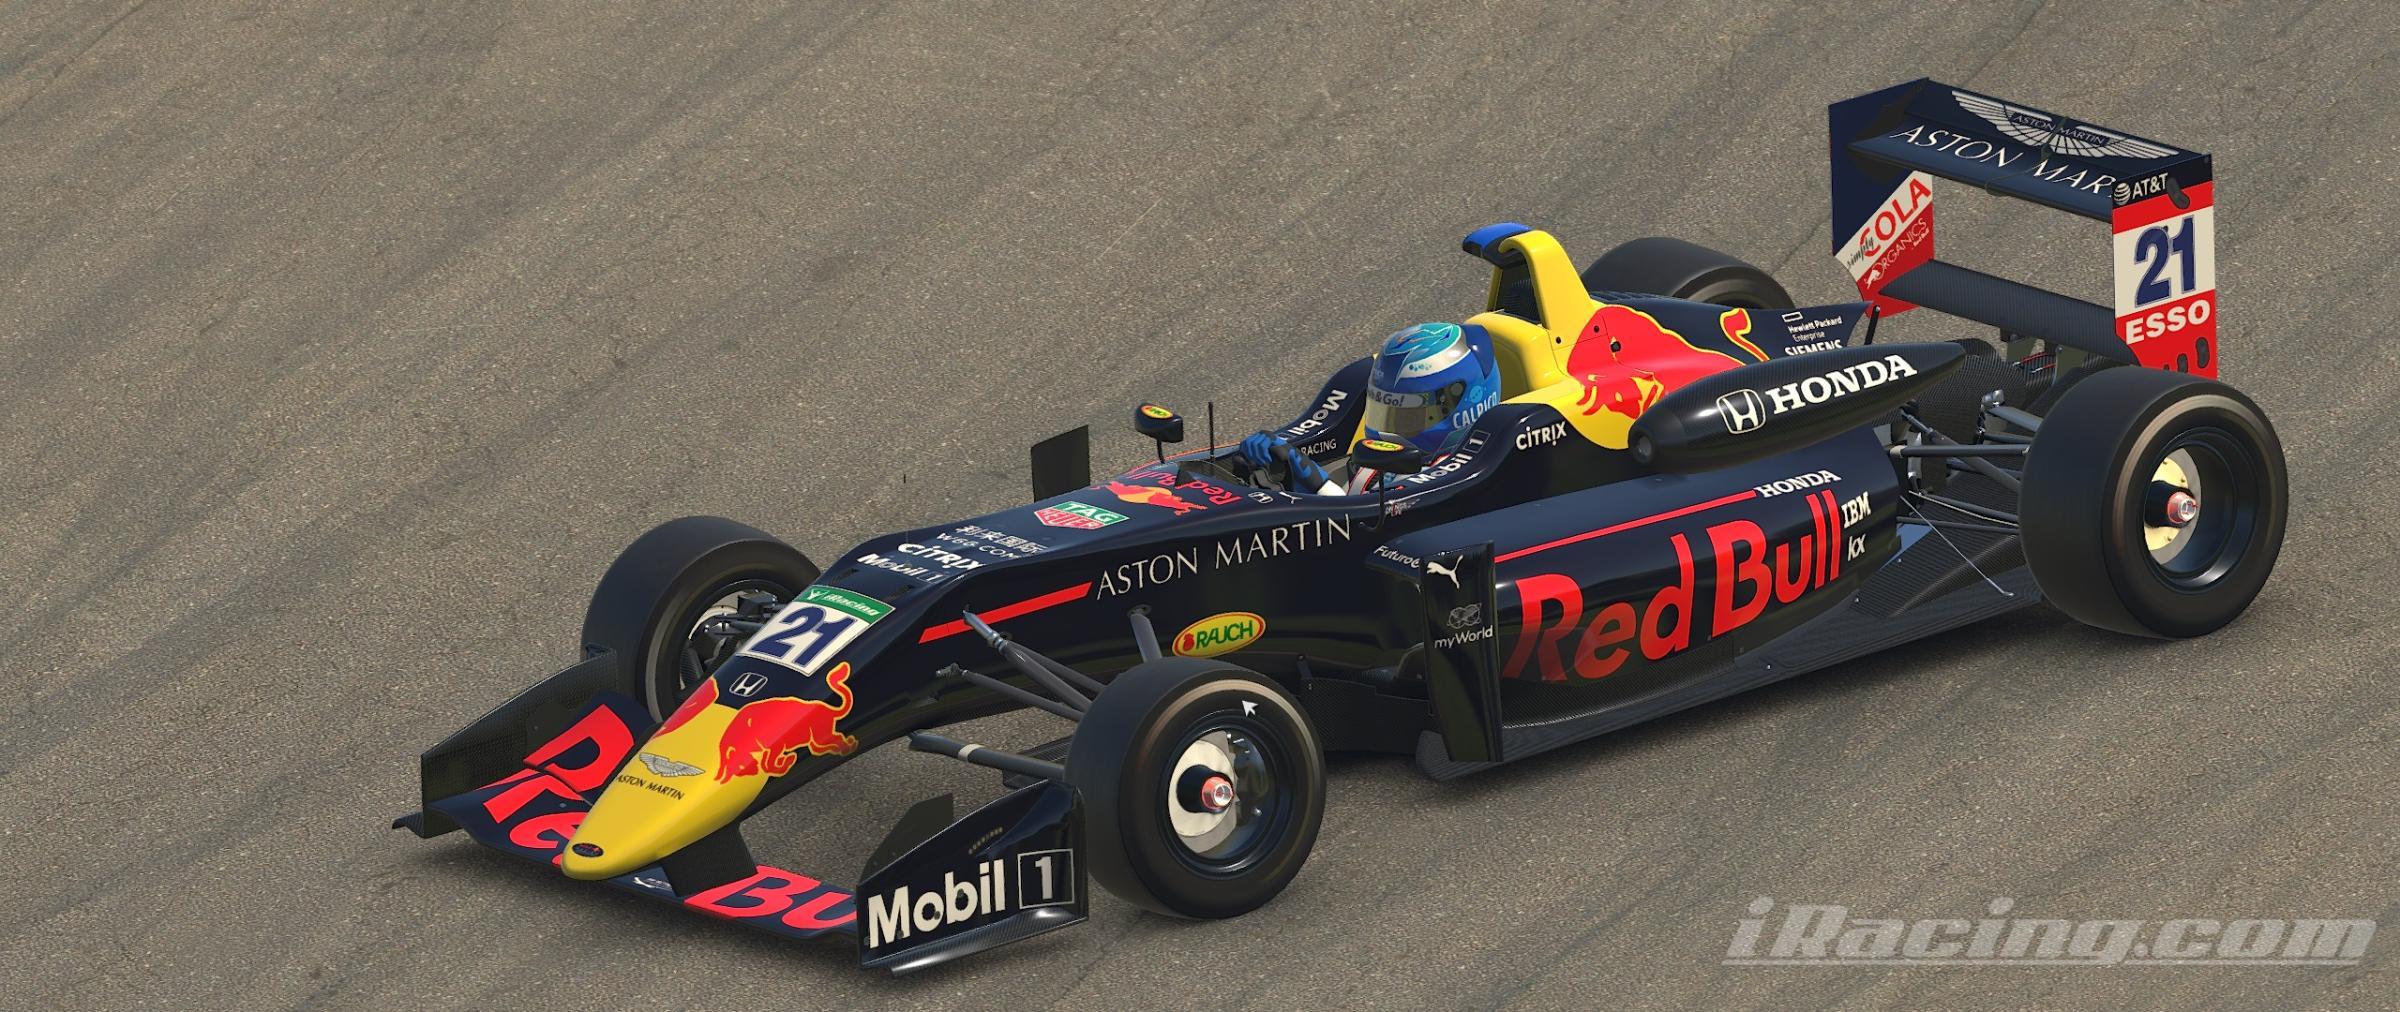 Preview of Aston Martin Red Bull Racing HONDA RB15 / F3 by Noriyuki Mizuno